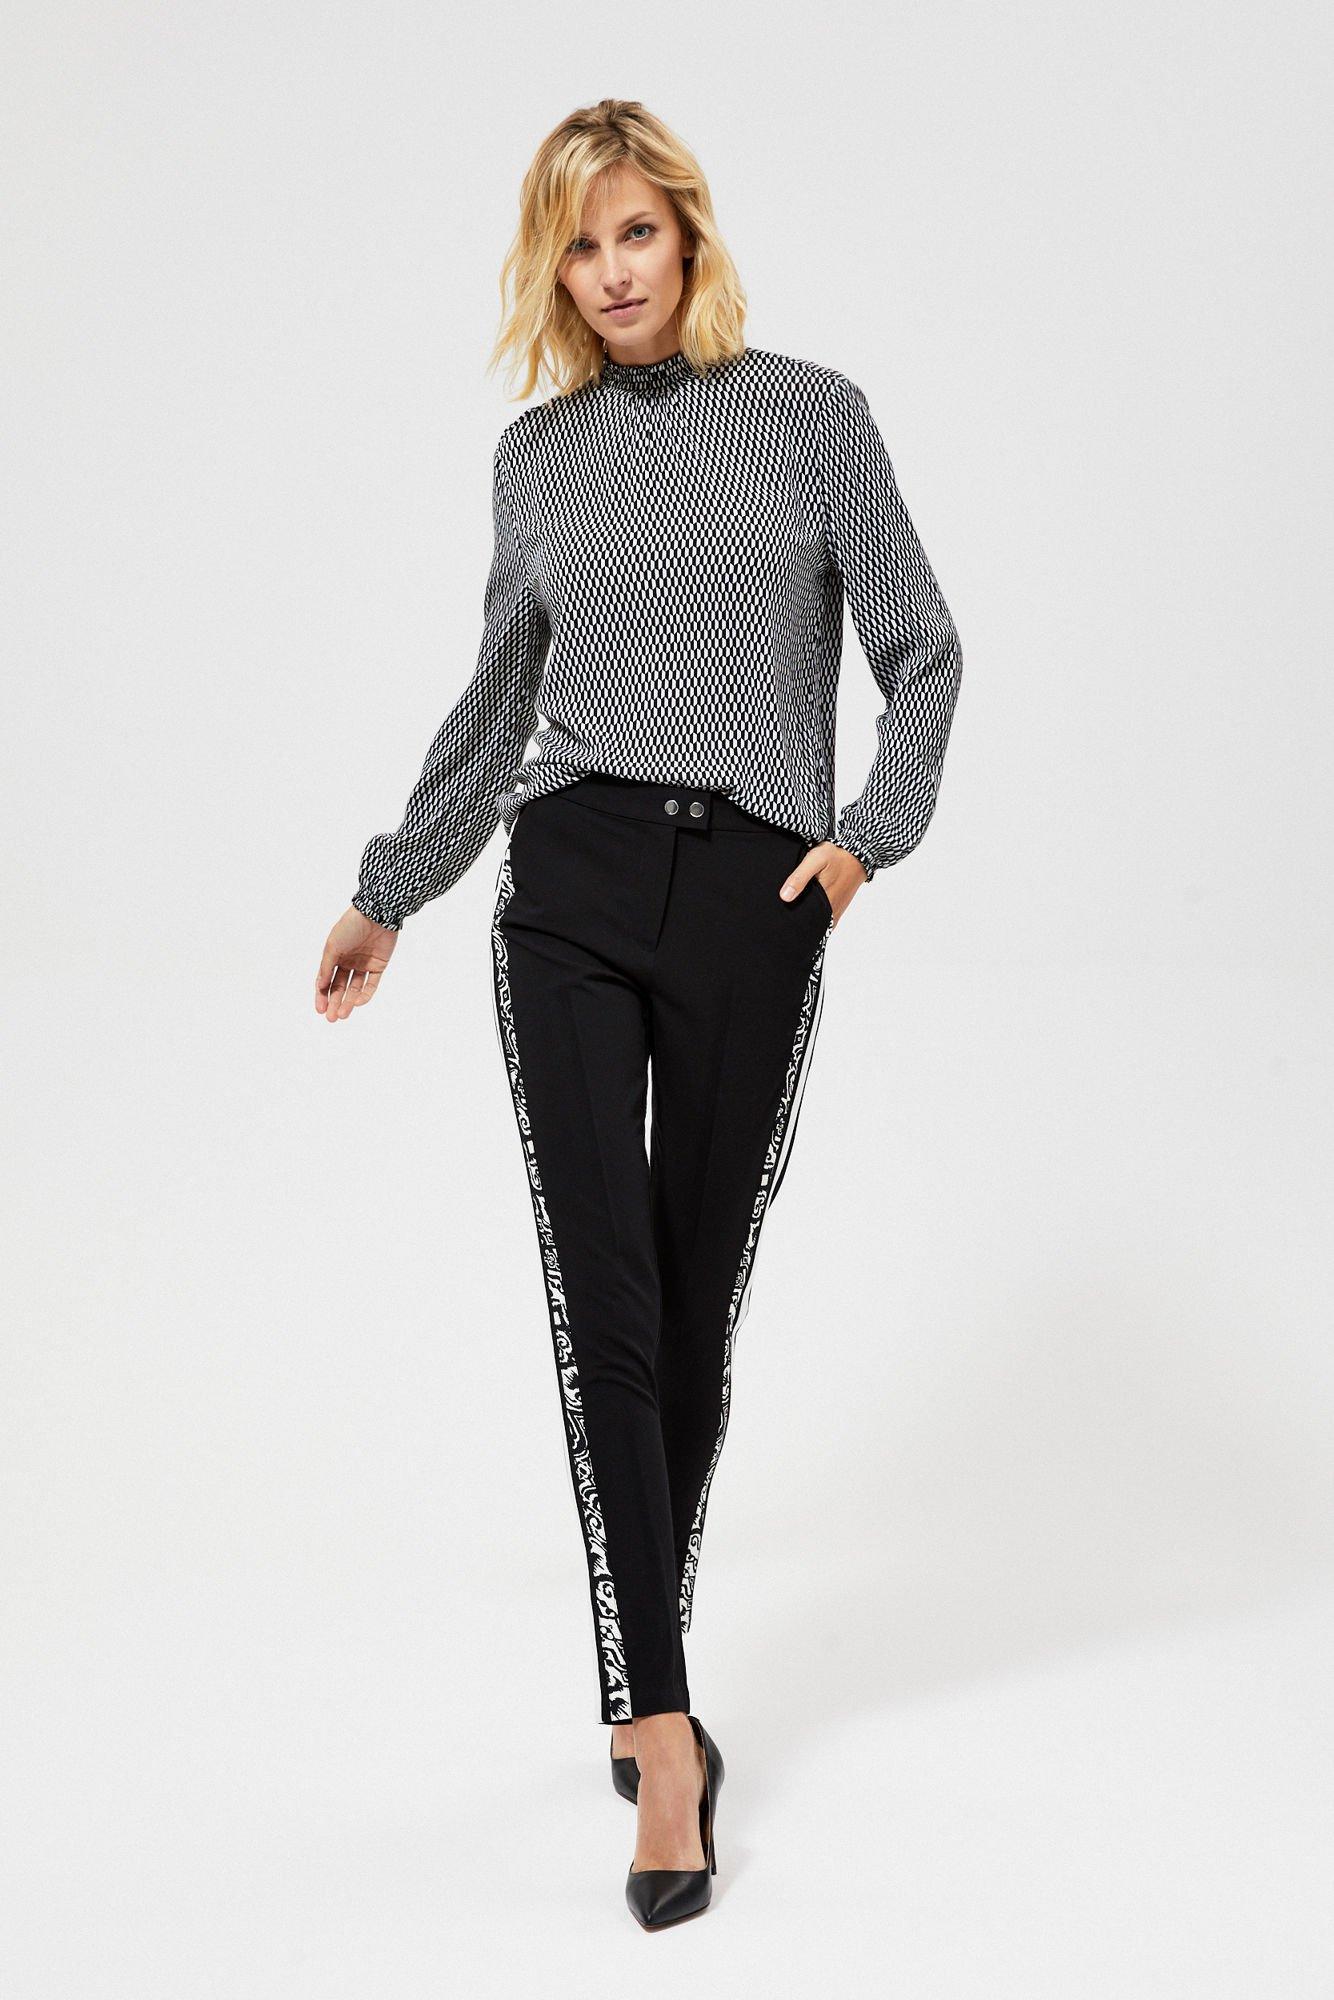 Spodnie z ozdobnymi lampasami